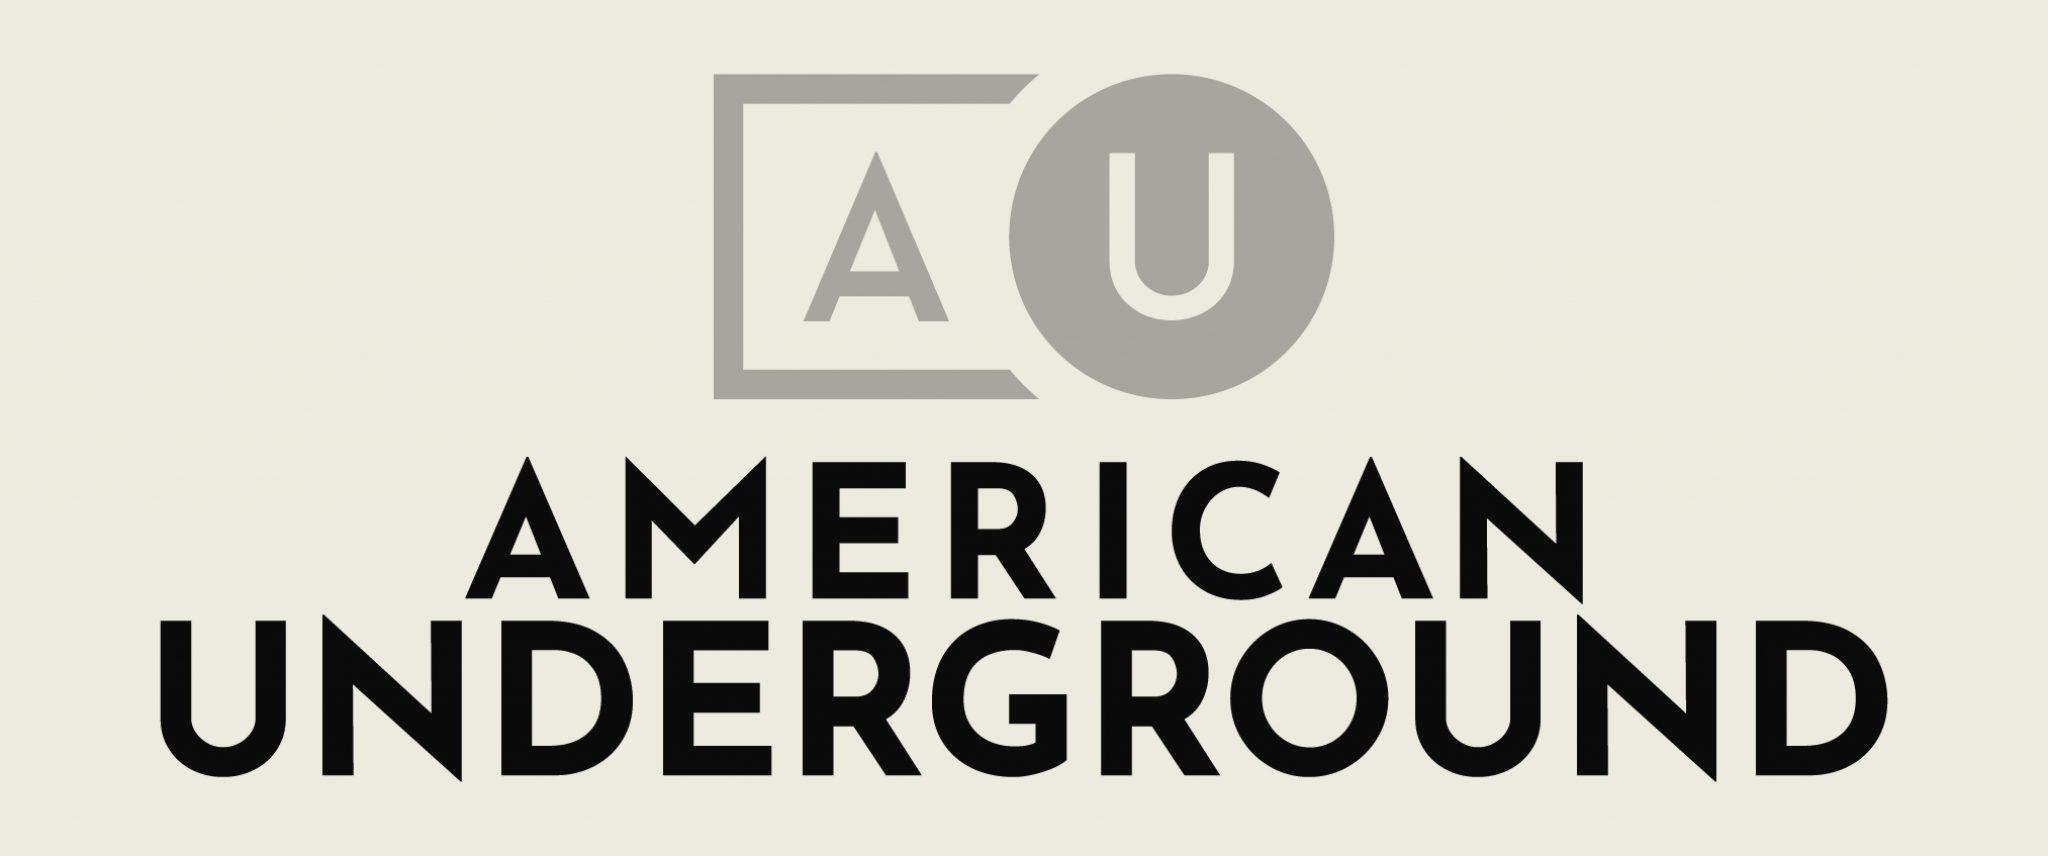 https://americantobacco.co/wp-content/uploads/2020/01/logo_american_underground.jpg